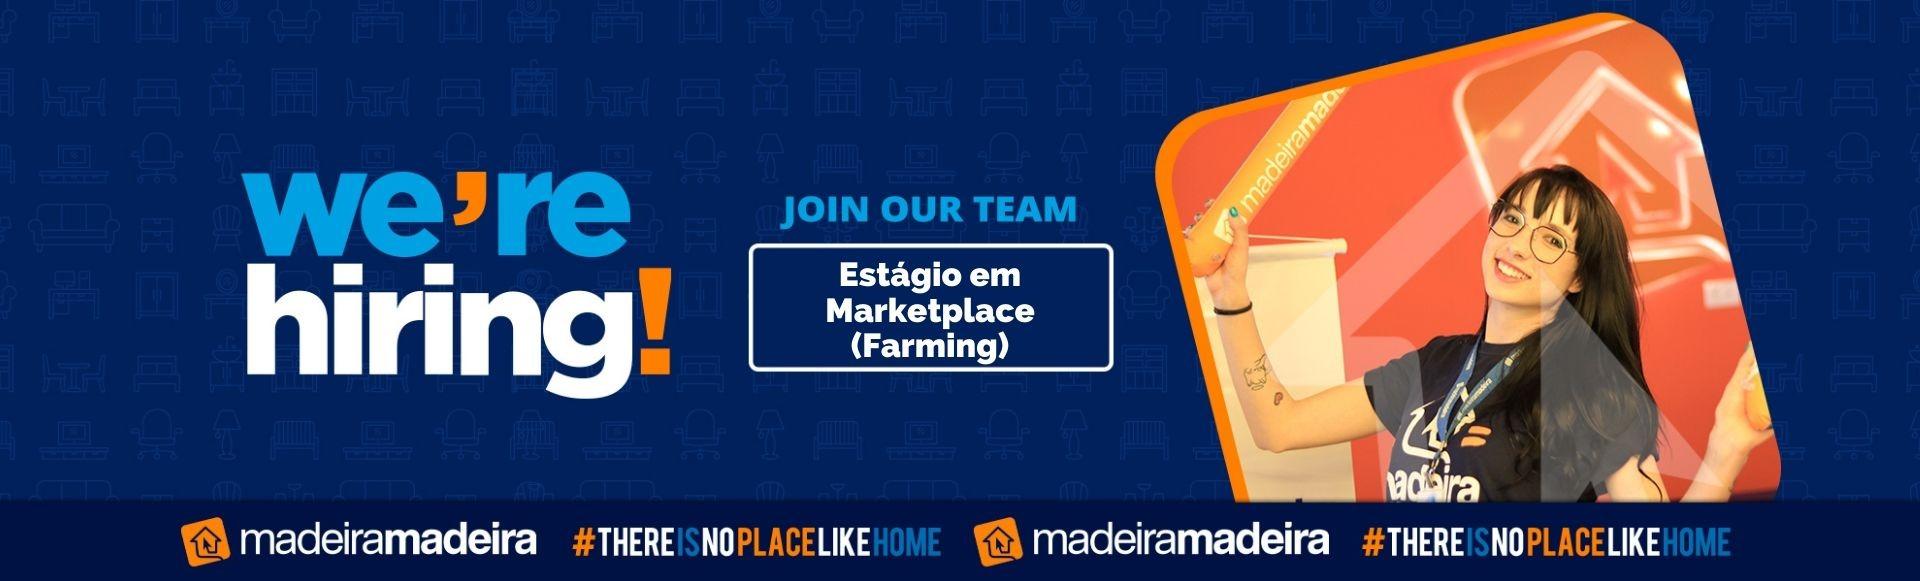 Estágio em Marketplace - Farming (Curitiba-PR)